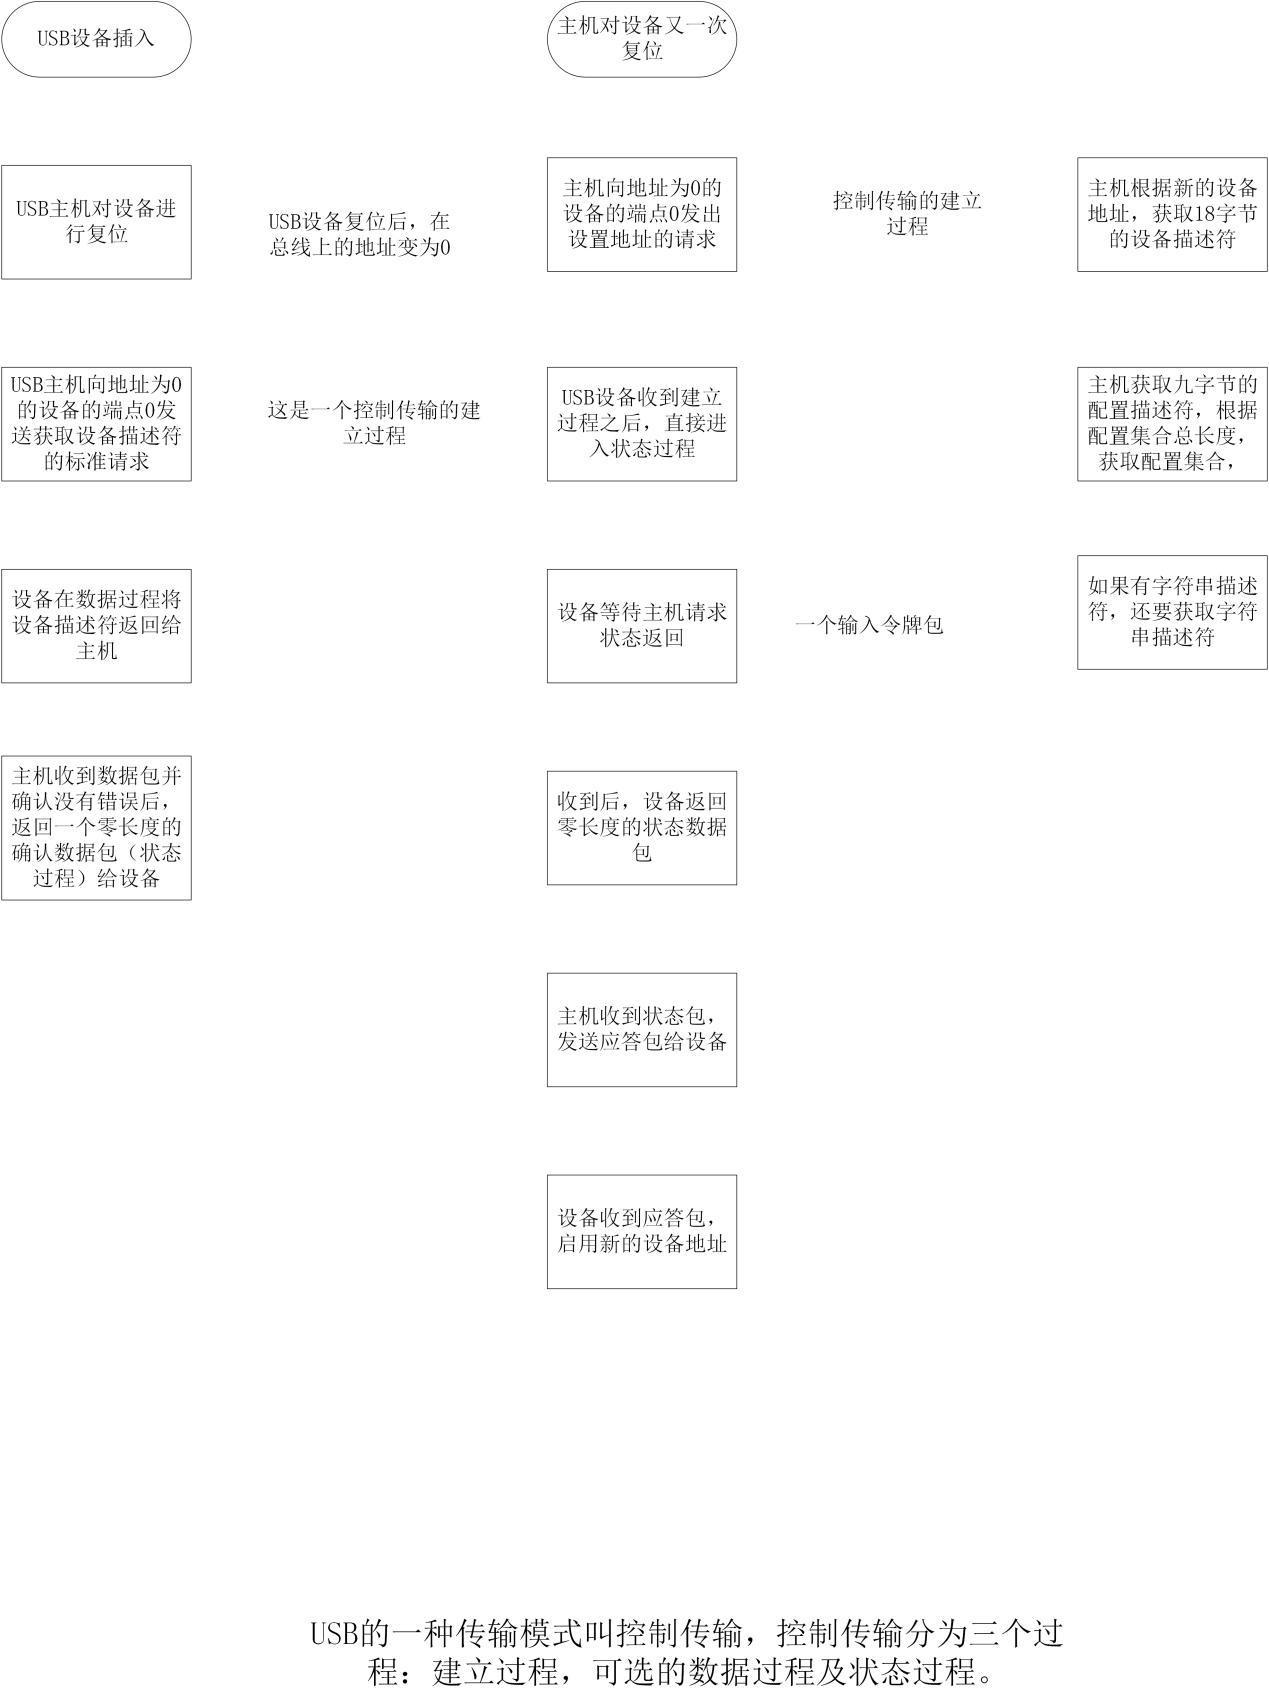 USB枚举过程.png